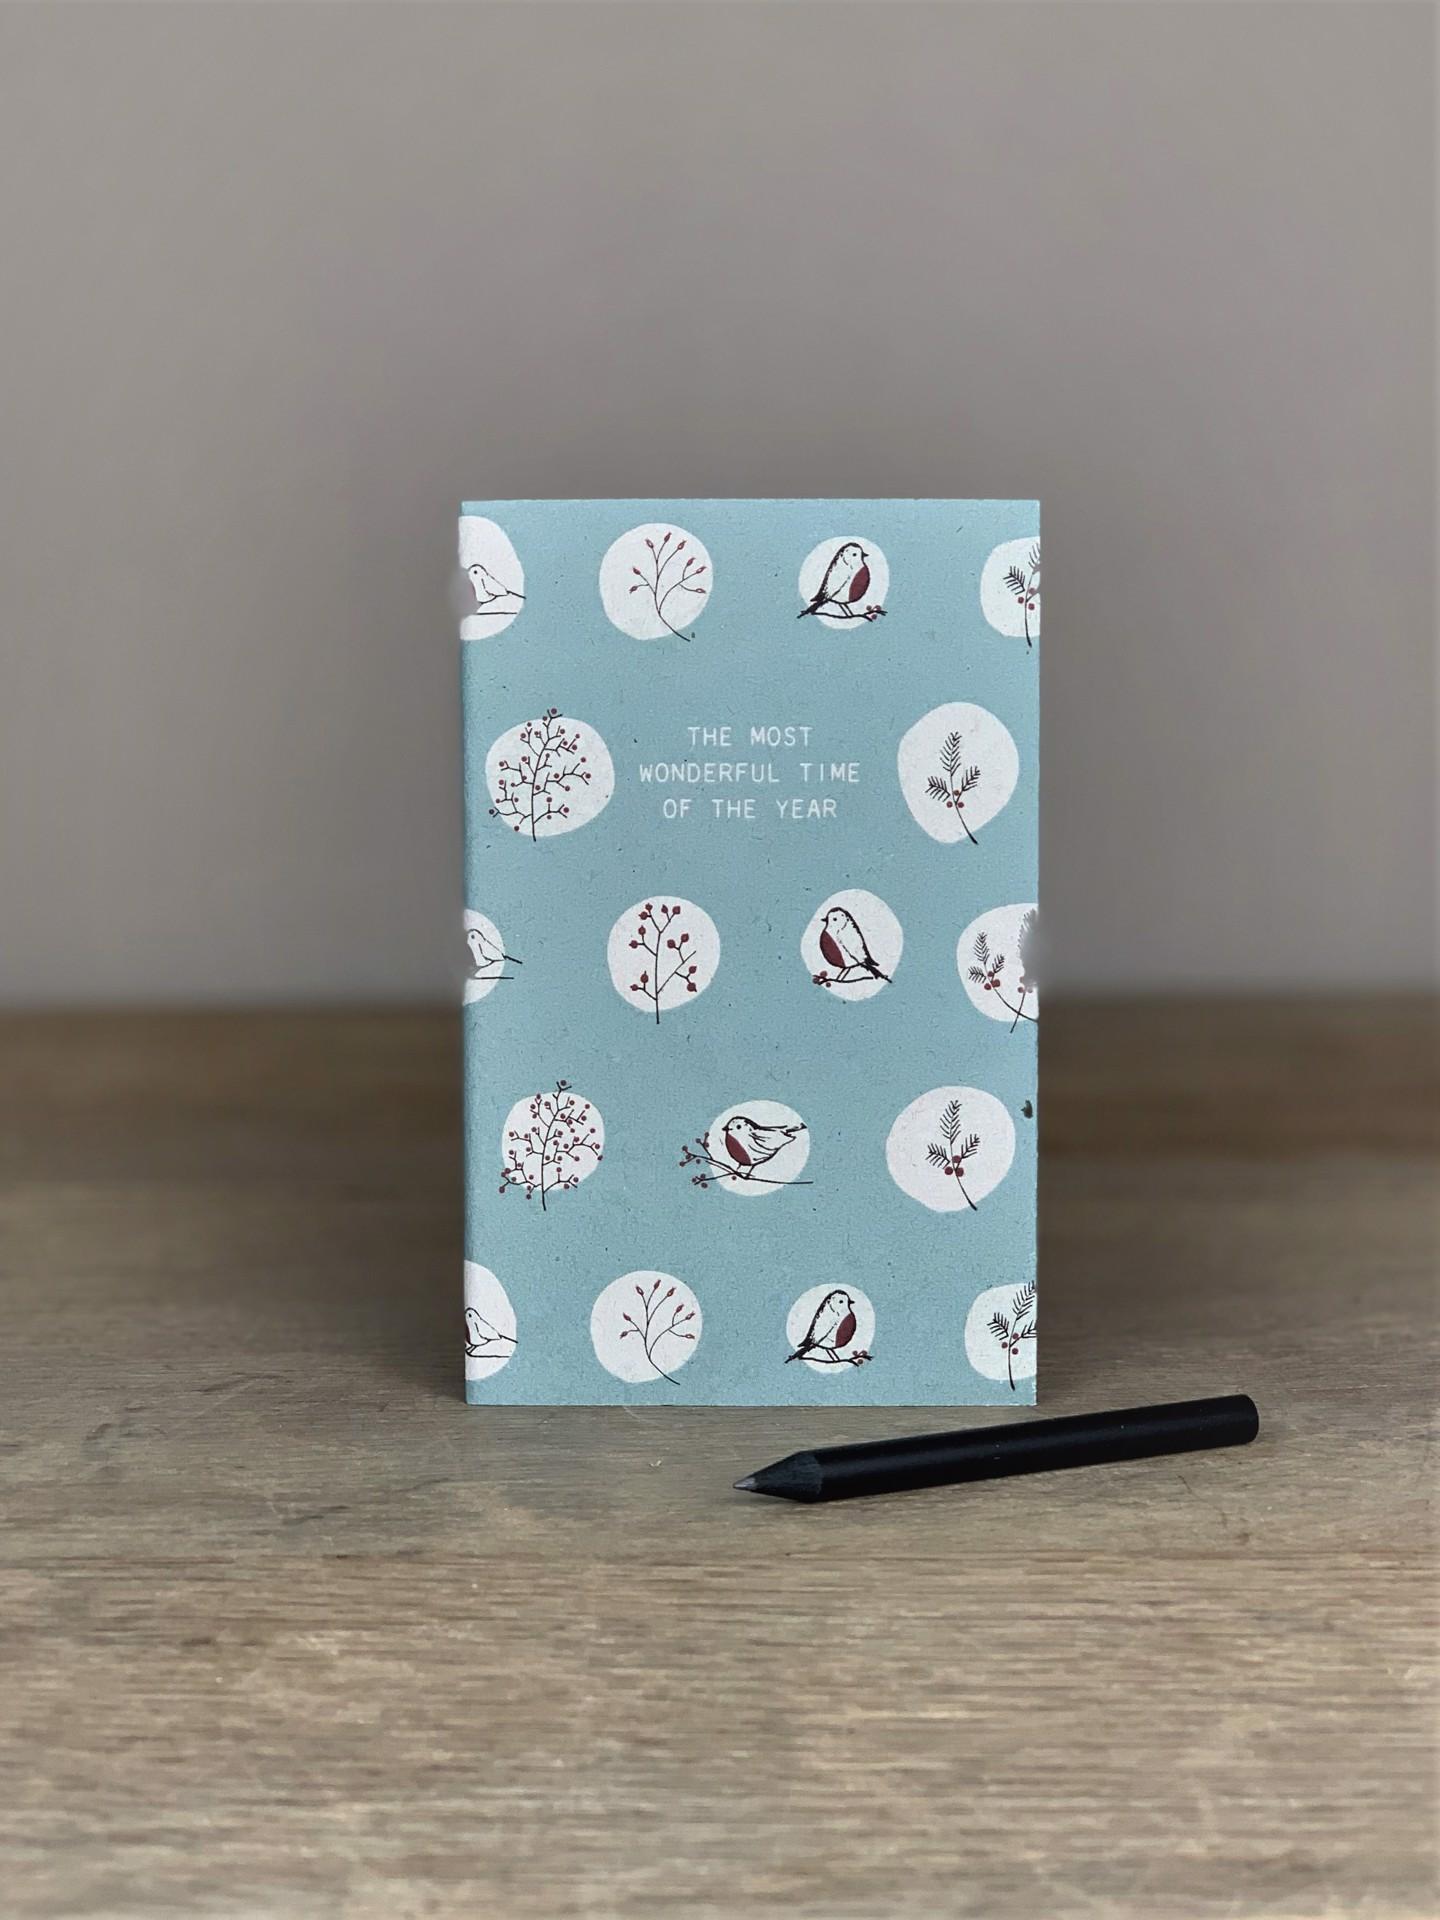 Notizheft Christmas Lists & Ideas blau